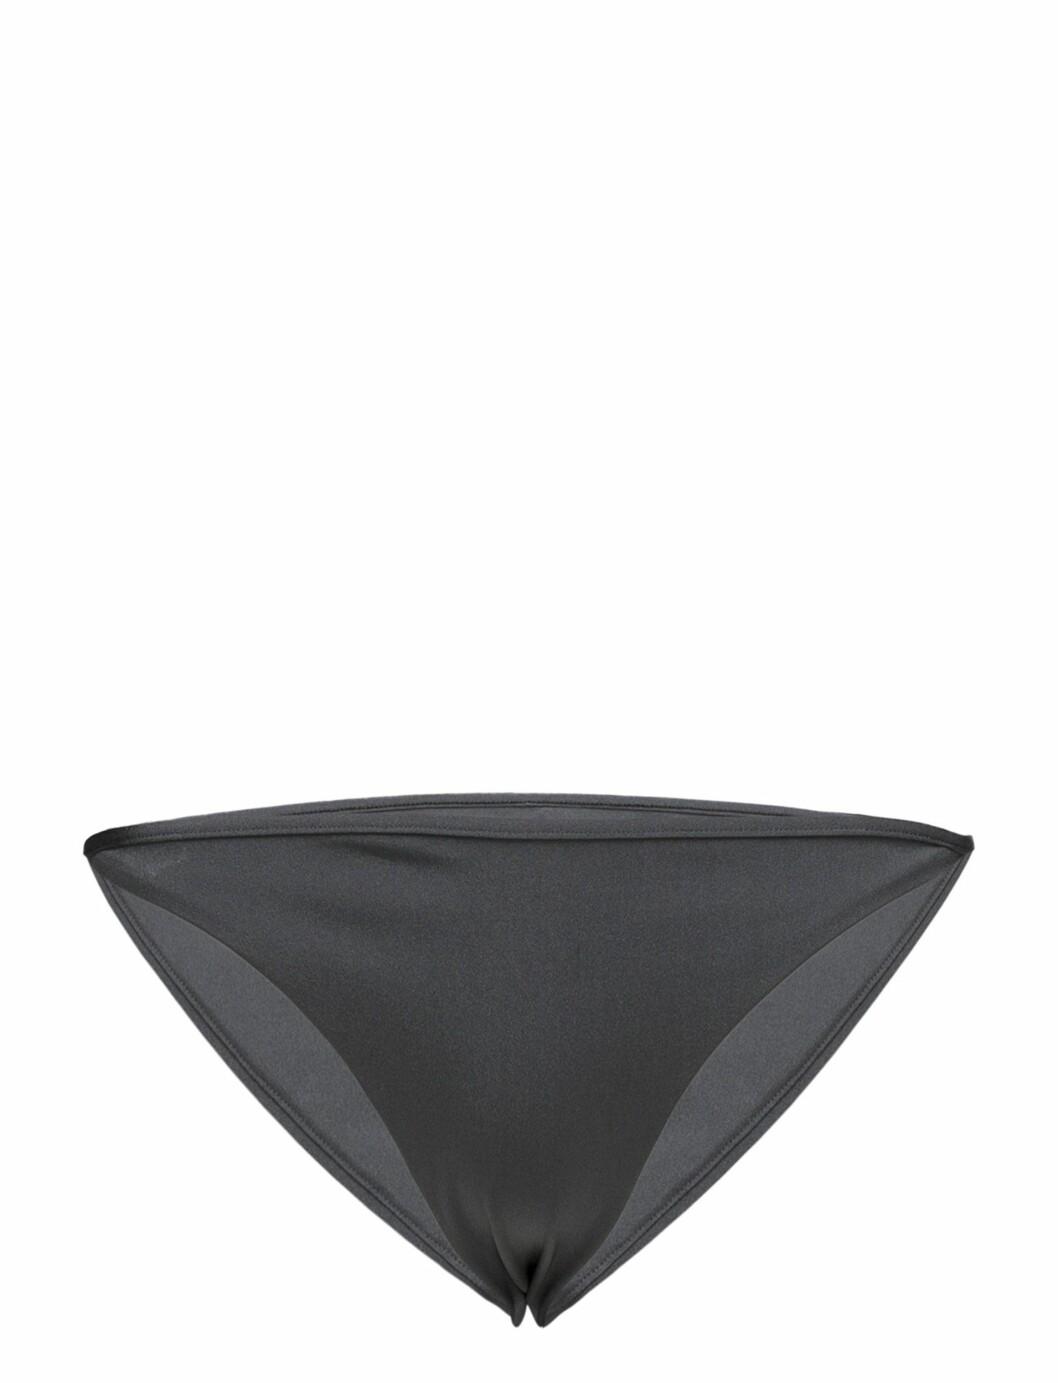 <strong>Bikinitruse fra Filippa K  400,-  https:</strong>//www.boozt.com/no/no/filippa-k-soft-sport/shiny-mini-brief_16654026/16654027?position=98&relNavId=70101&group=related